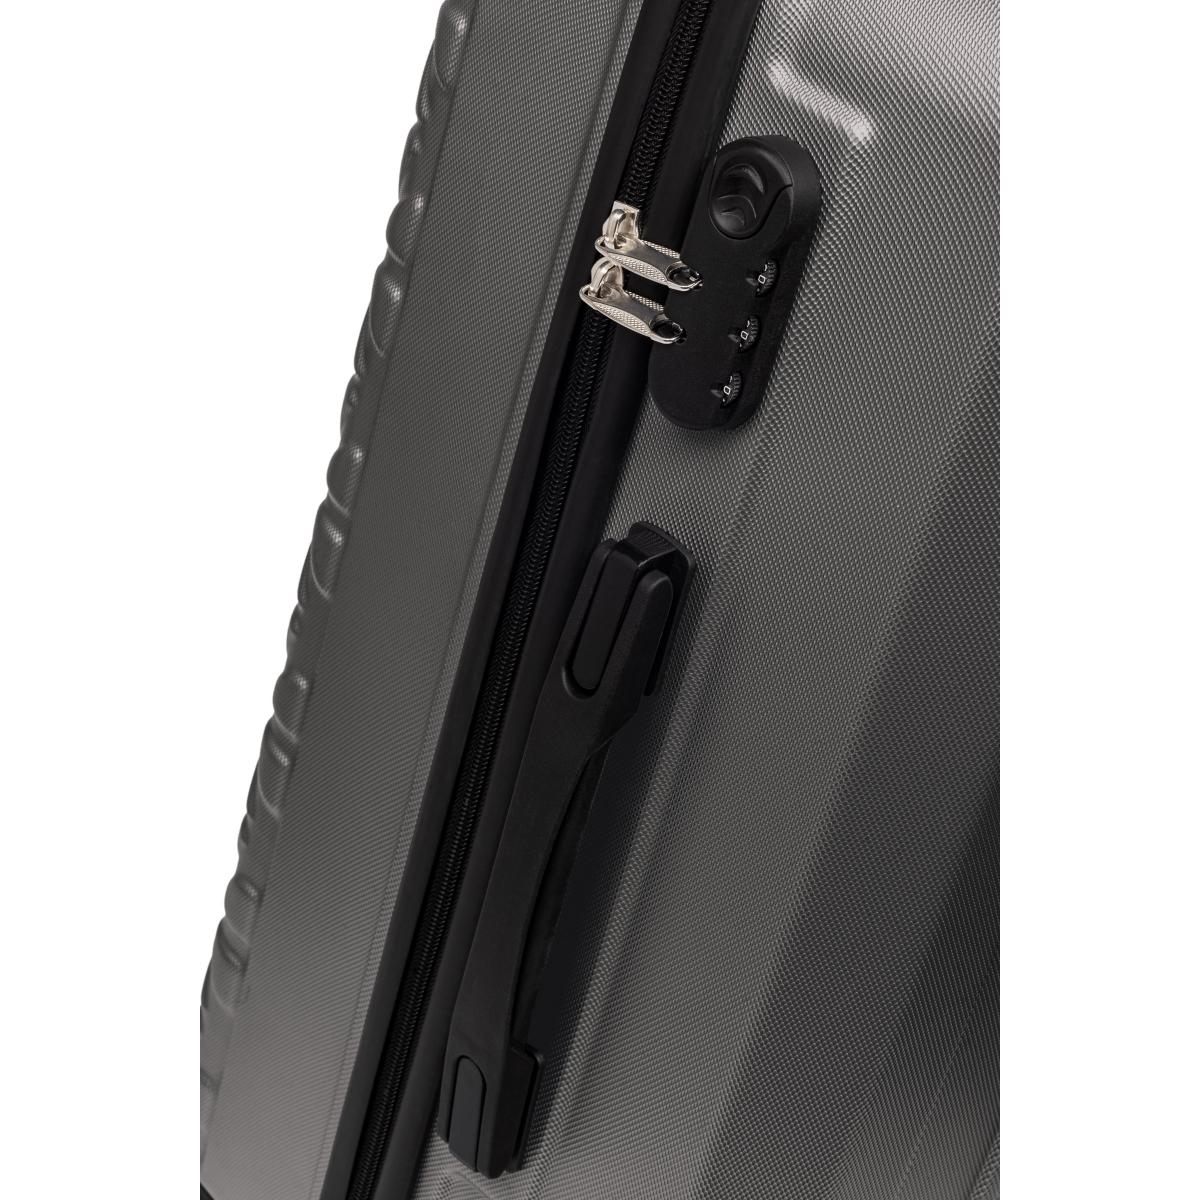 Gedox Abs 3'lü Valiz Seyahat Seti - Model:800.02 Koyu Gri